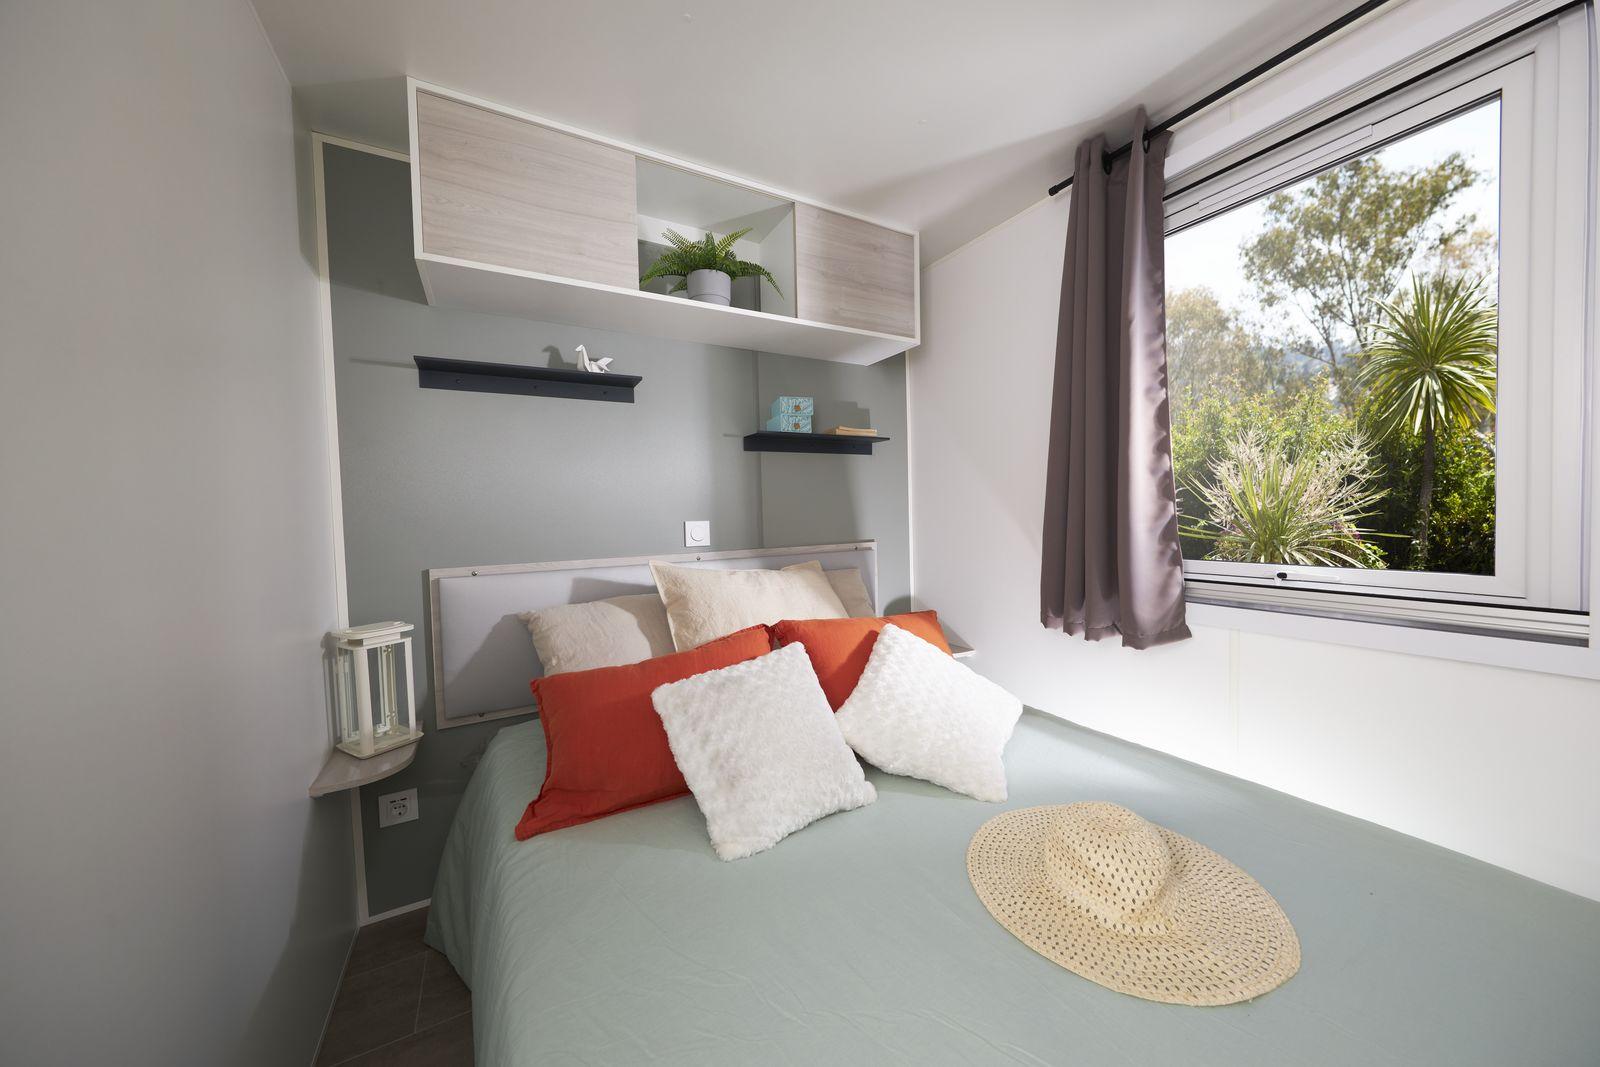 residences-trigano-mobil-home-2chambres-evolution29ti (1)